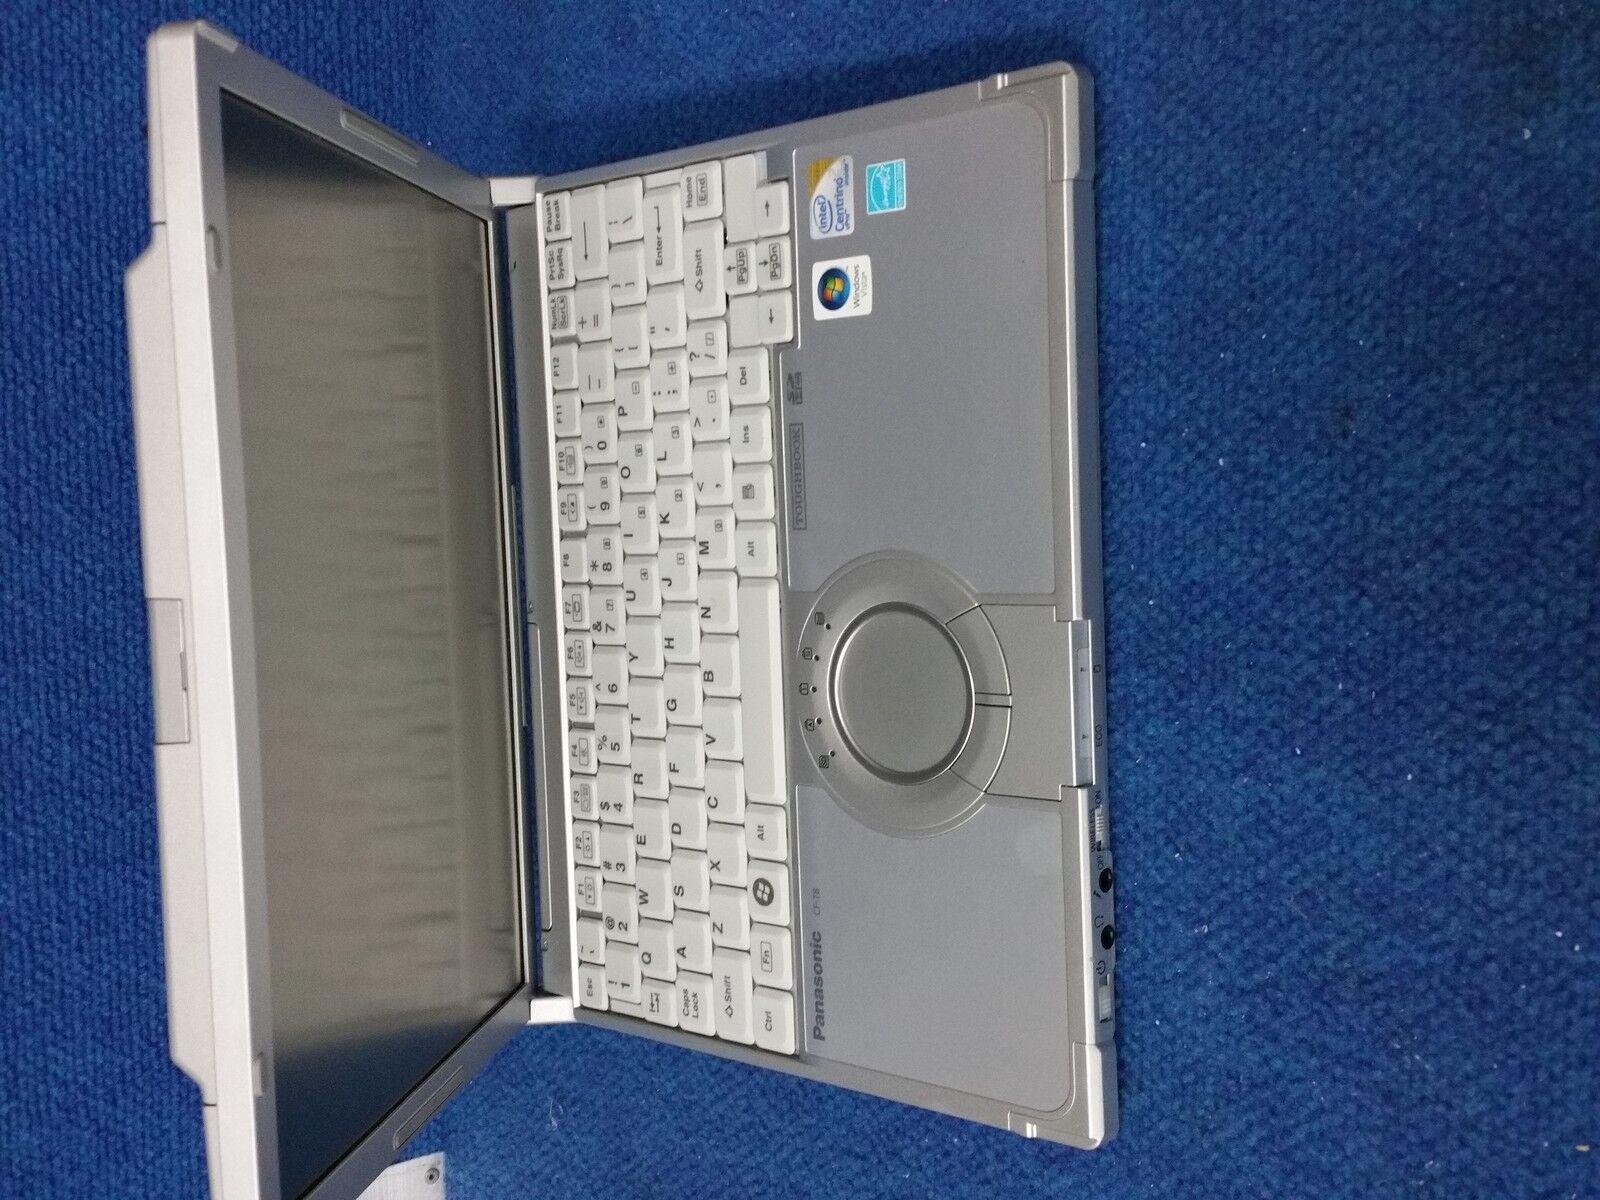 Panasonic Toughbook CF-T8 Stylus 4gb Ram 160GB W7  Ready to use